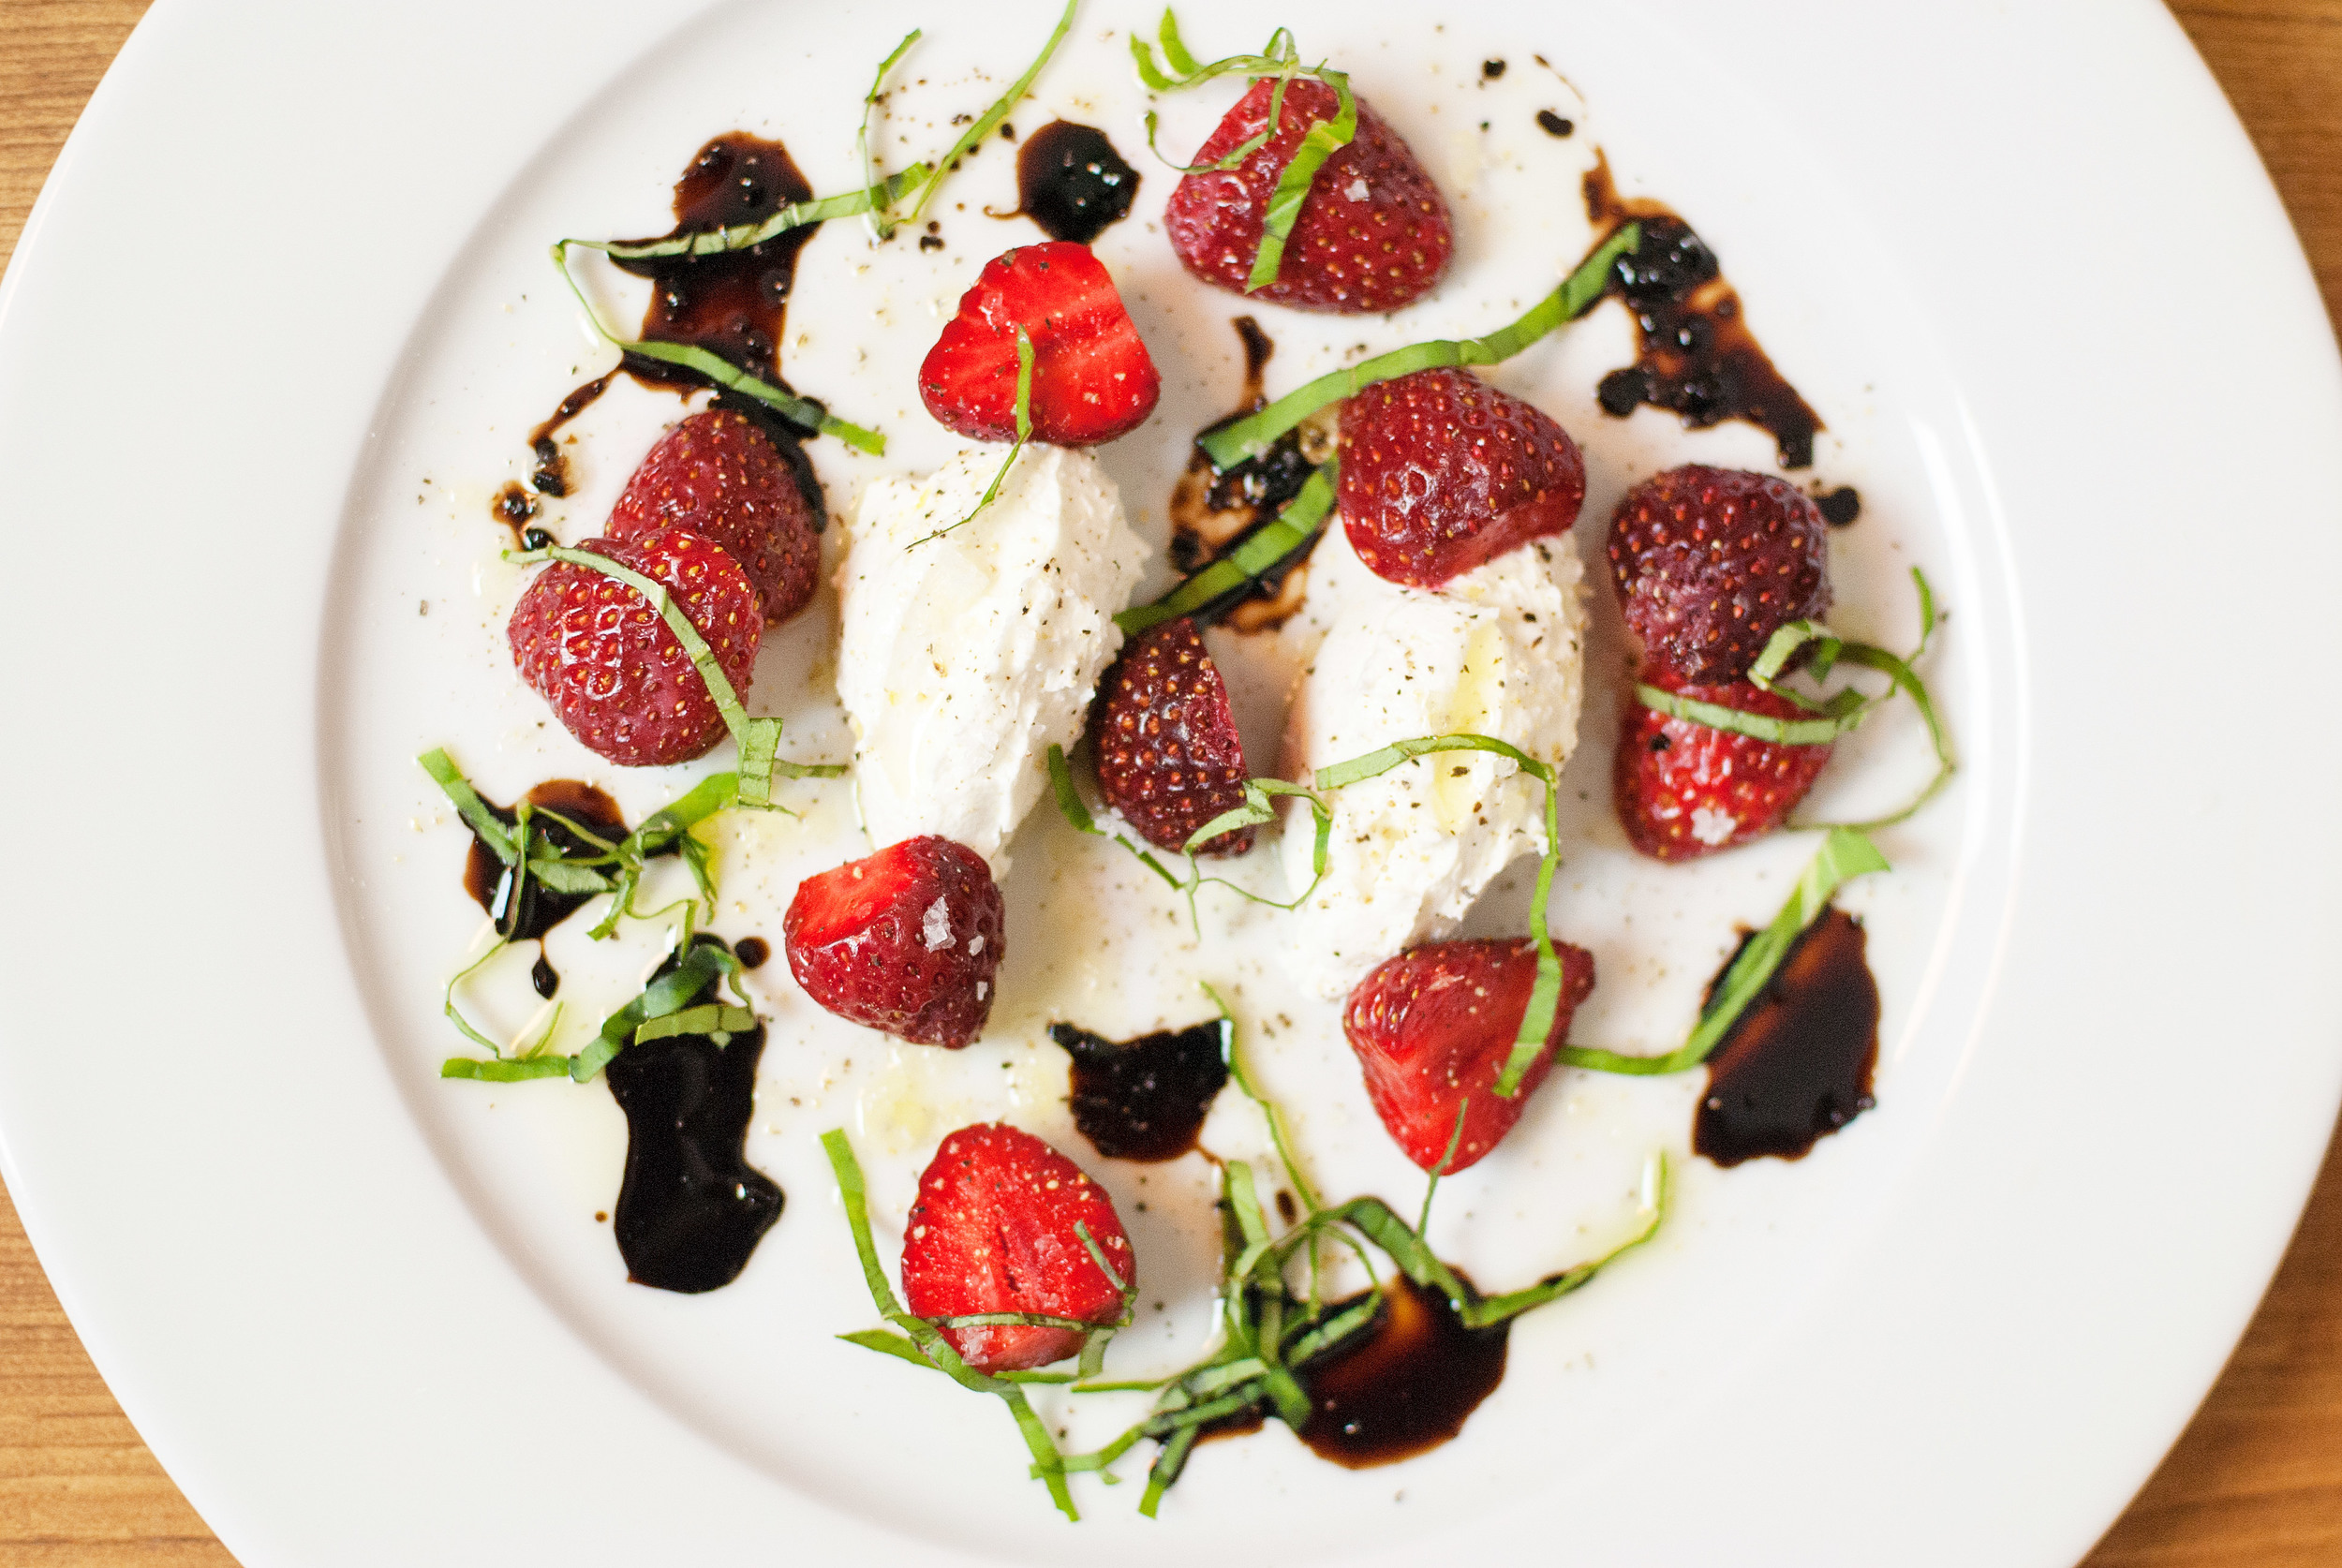 strawberry-caprese-salad-011.jpg